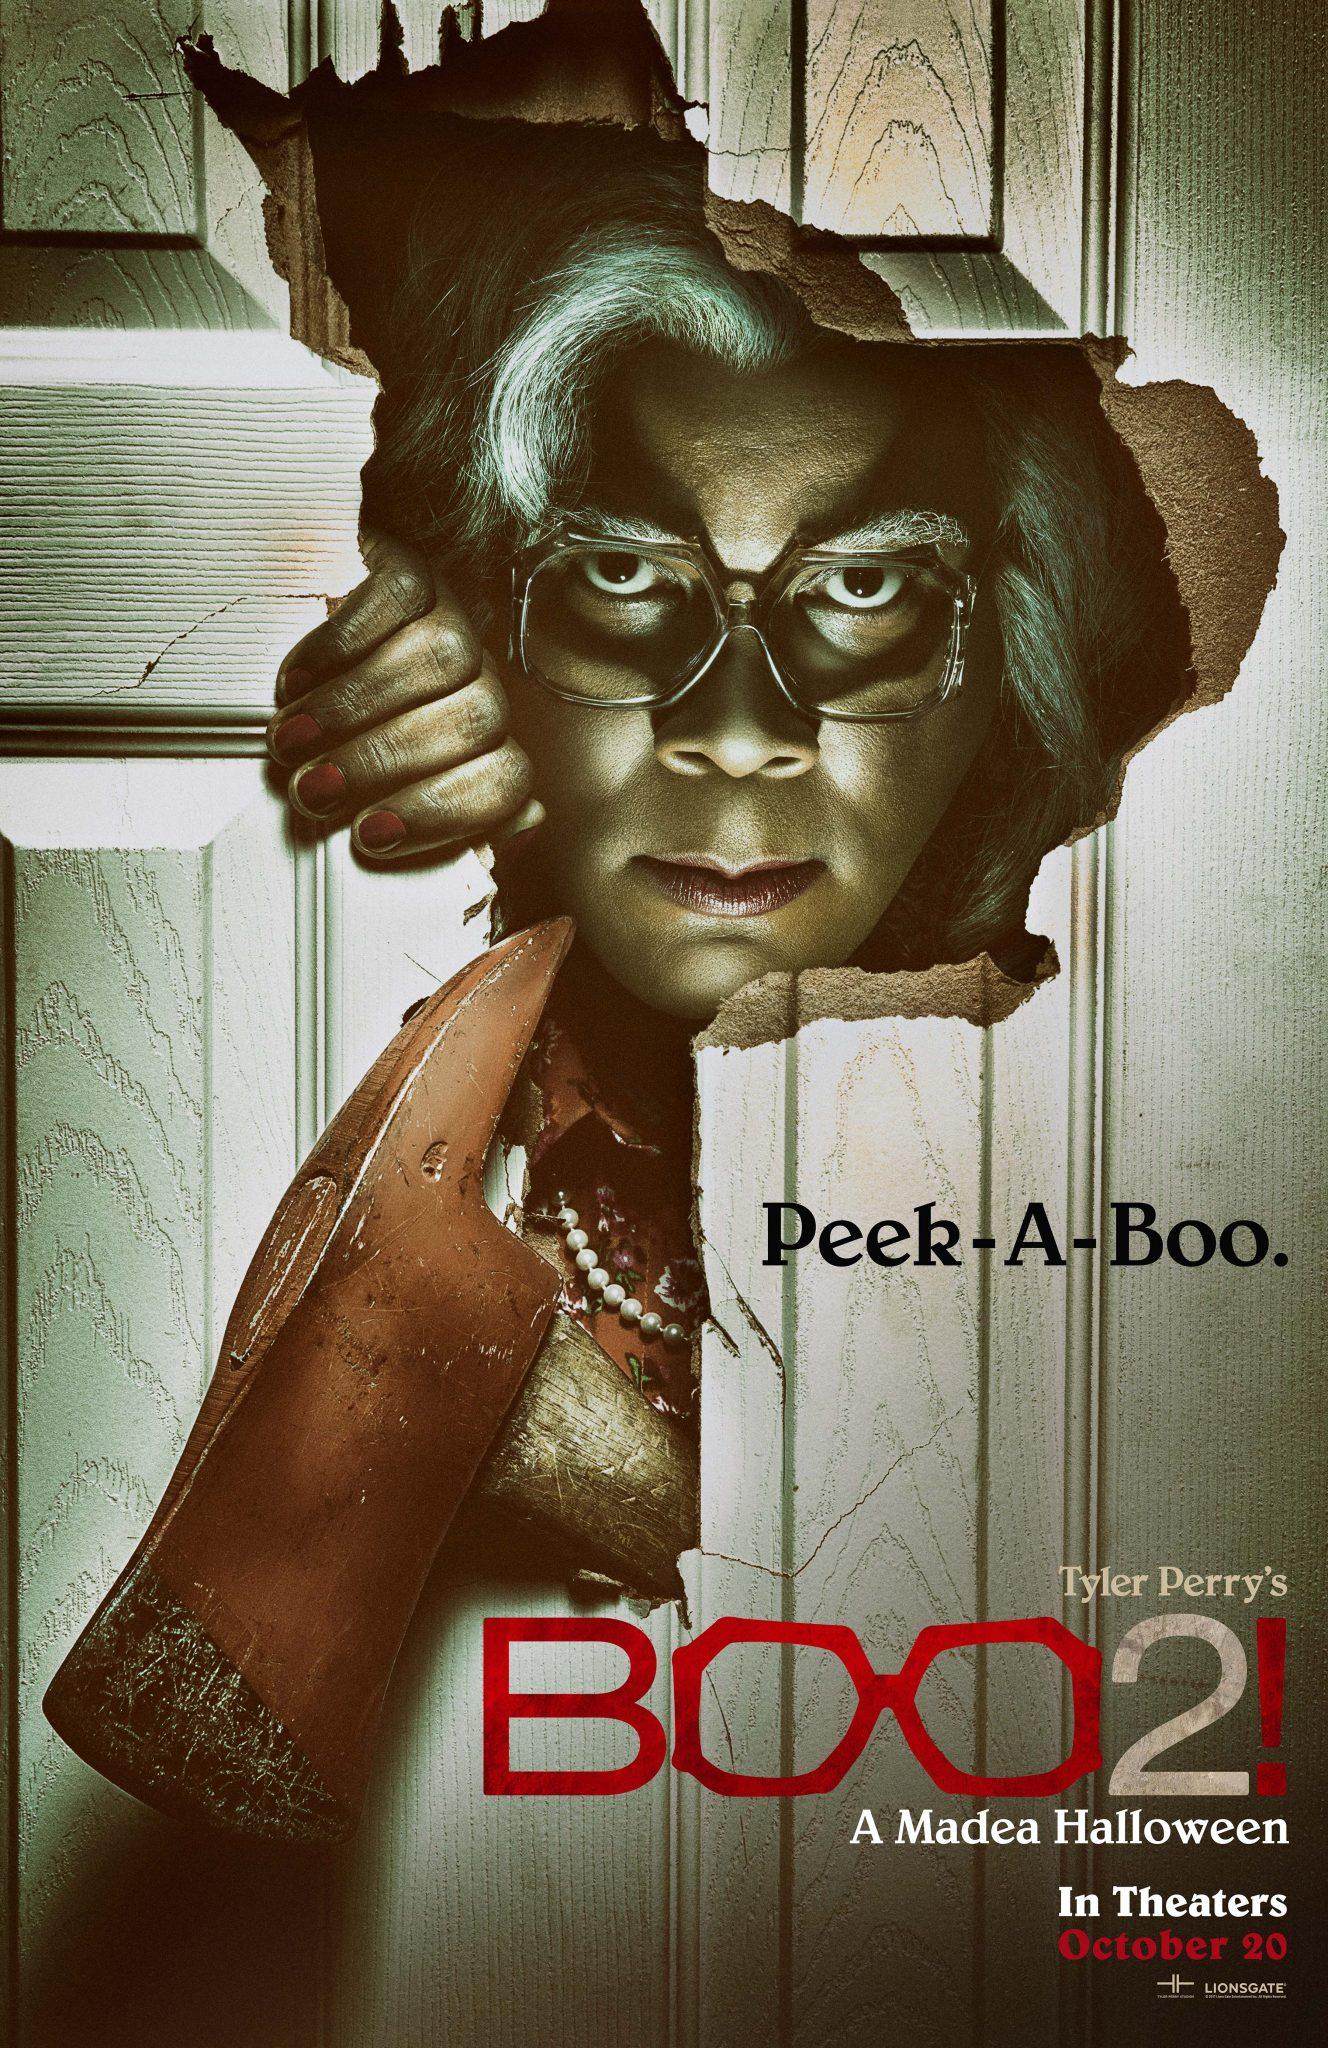 New Movie: Tyler Perry's Boo 2 A Madea Halloween